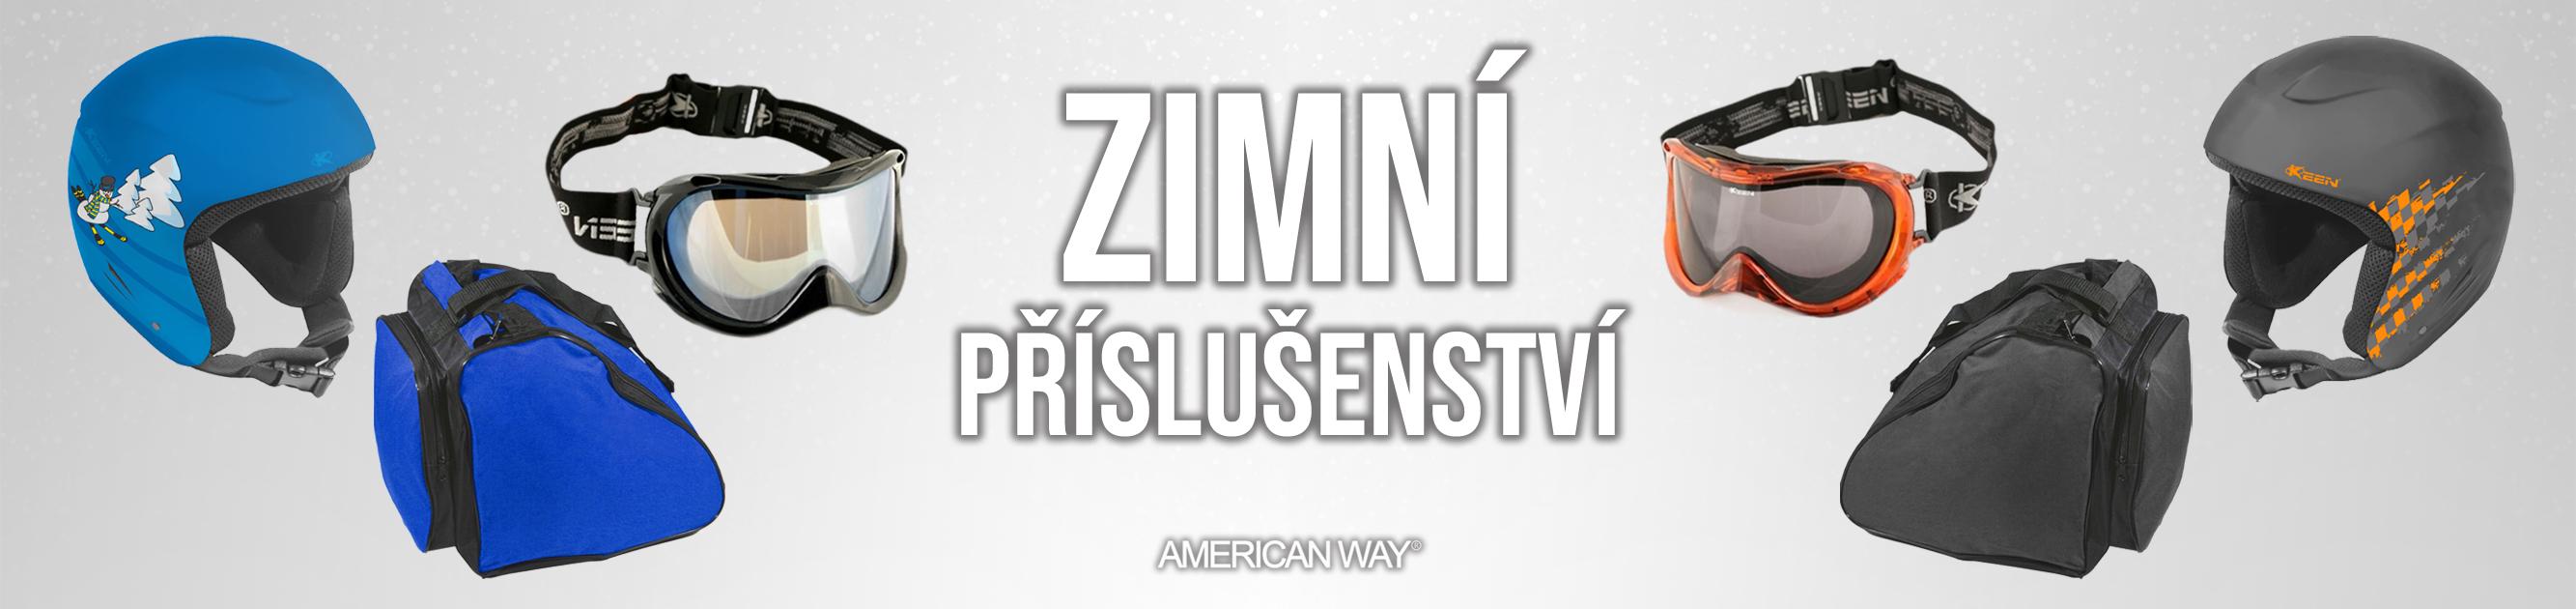 3Zimni_prislusenstvi_cz